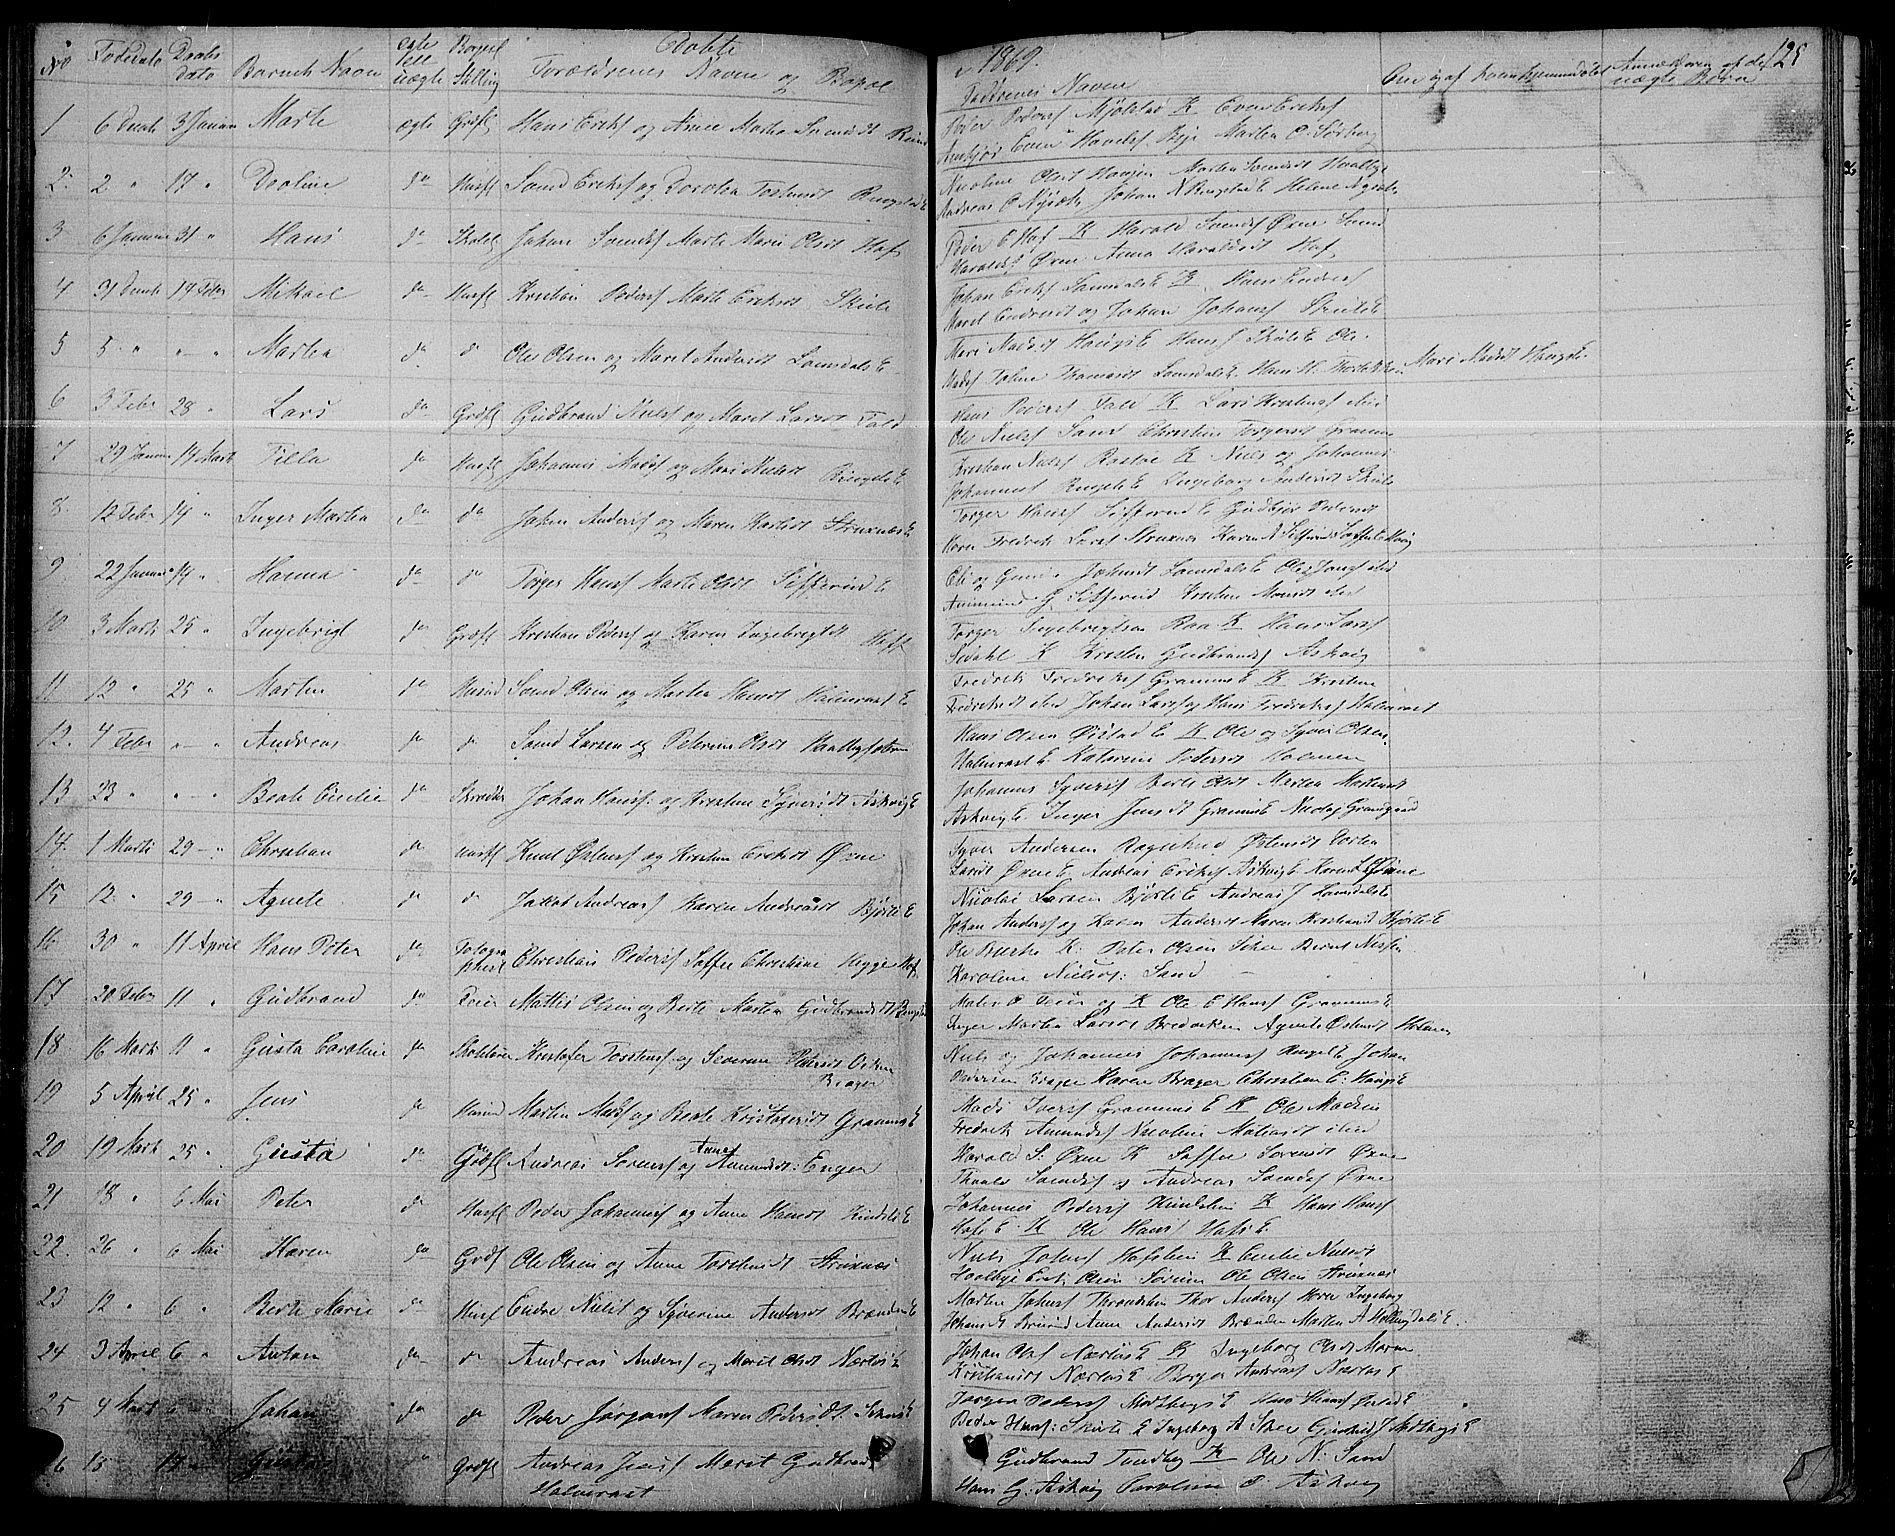 SAH, Søndre Land prestekontor, L/L0001: Klokkerbok nr. 1, 1849-1883, s. 125